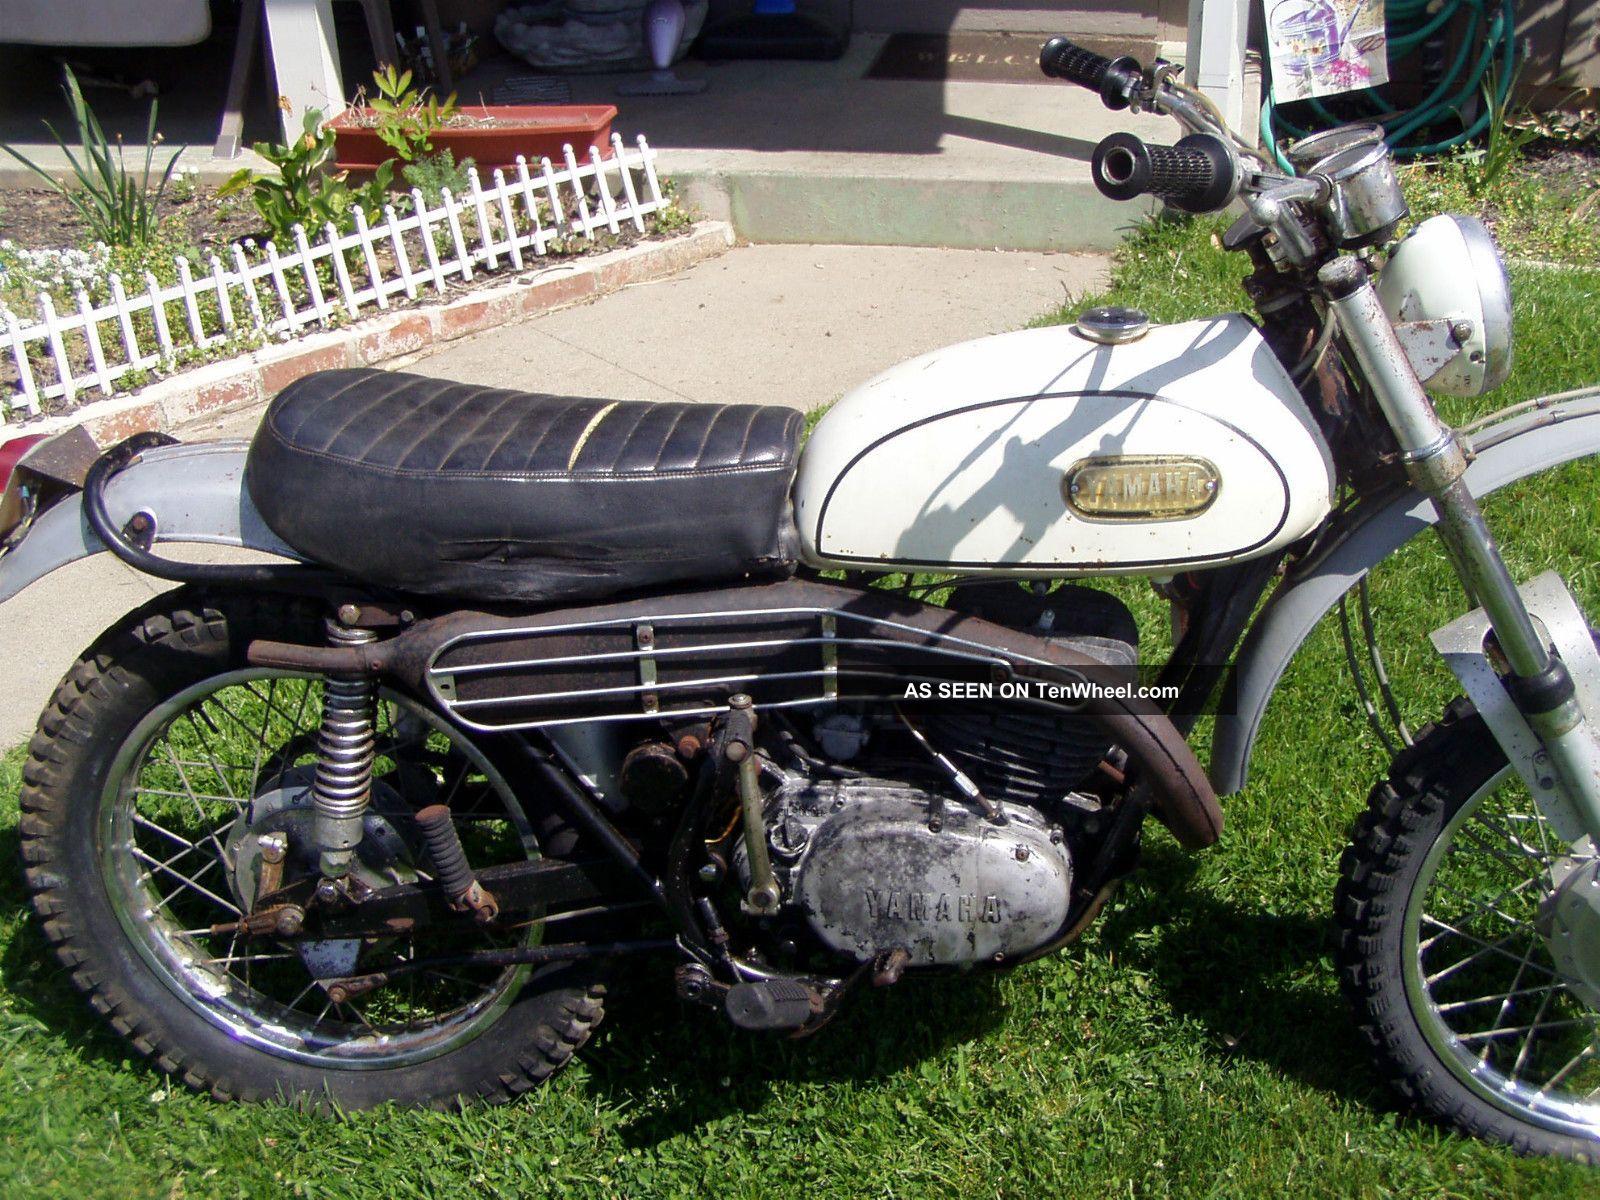 1968 Yamaha Dt1 Other photo